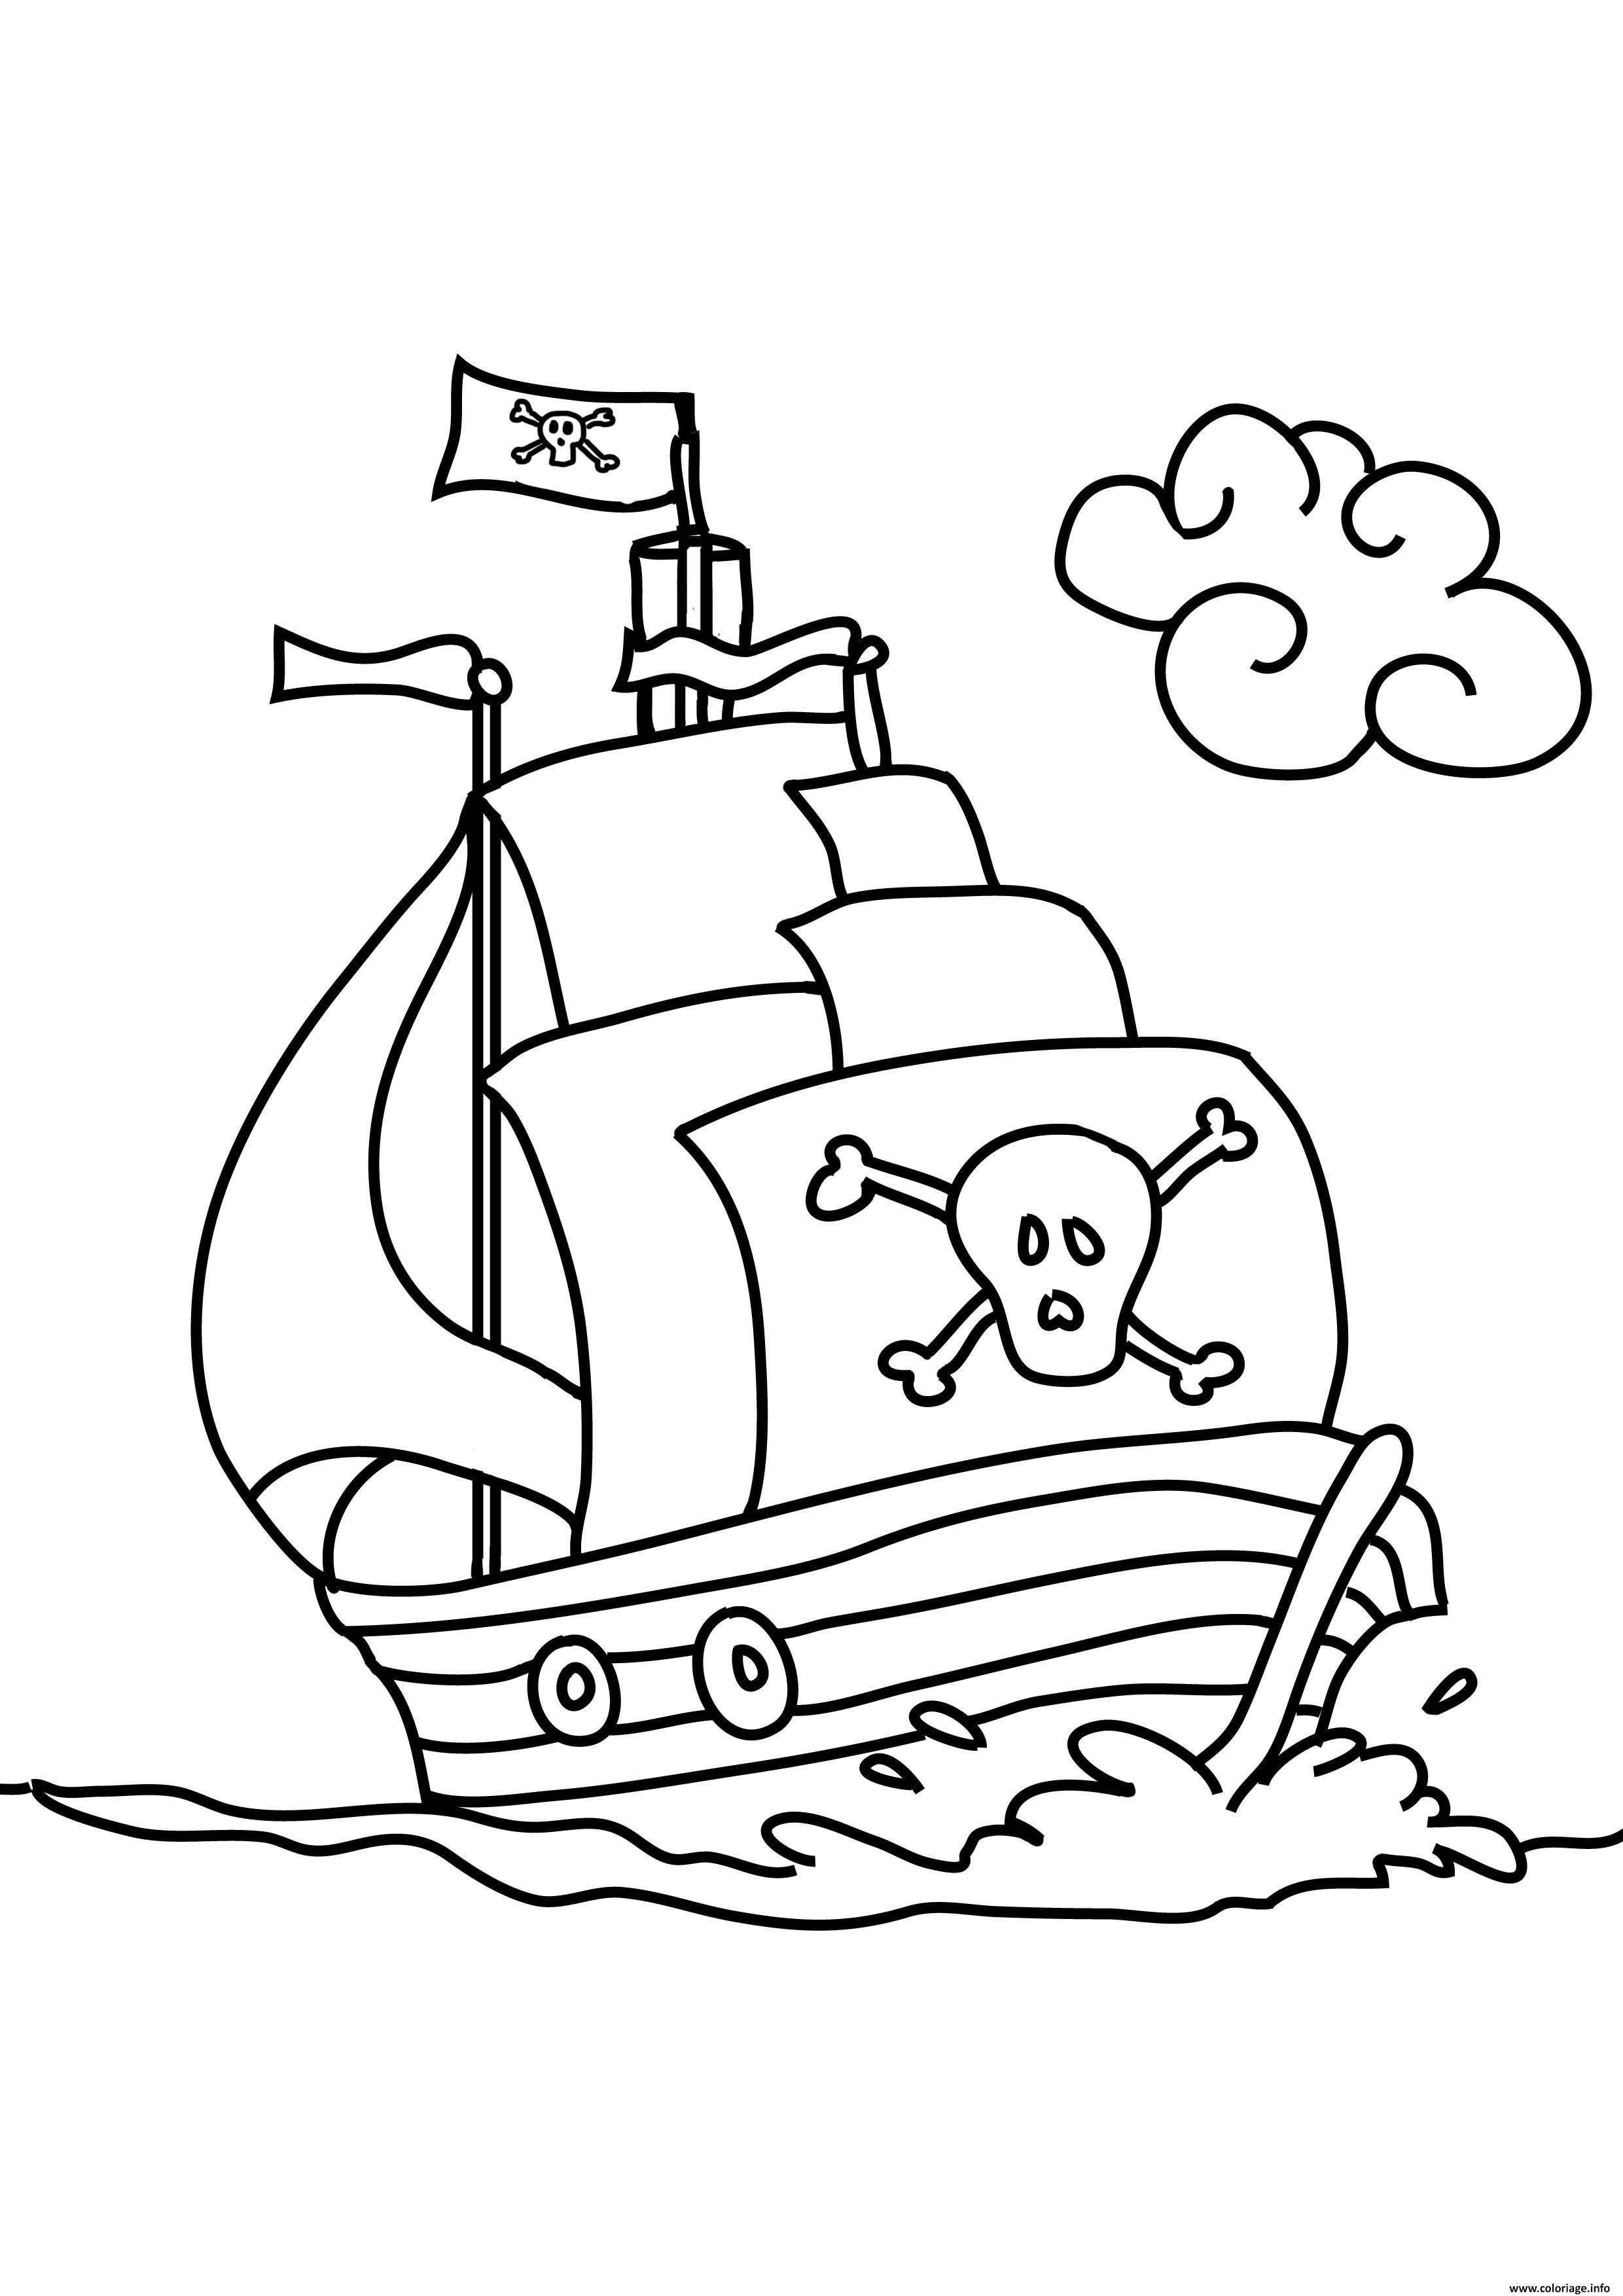 Coloriage Bateau Simple.Coloriage Bateau De Pirates Facile Maternelle Dessin